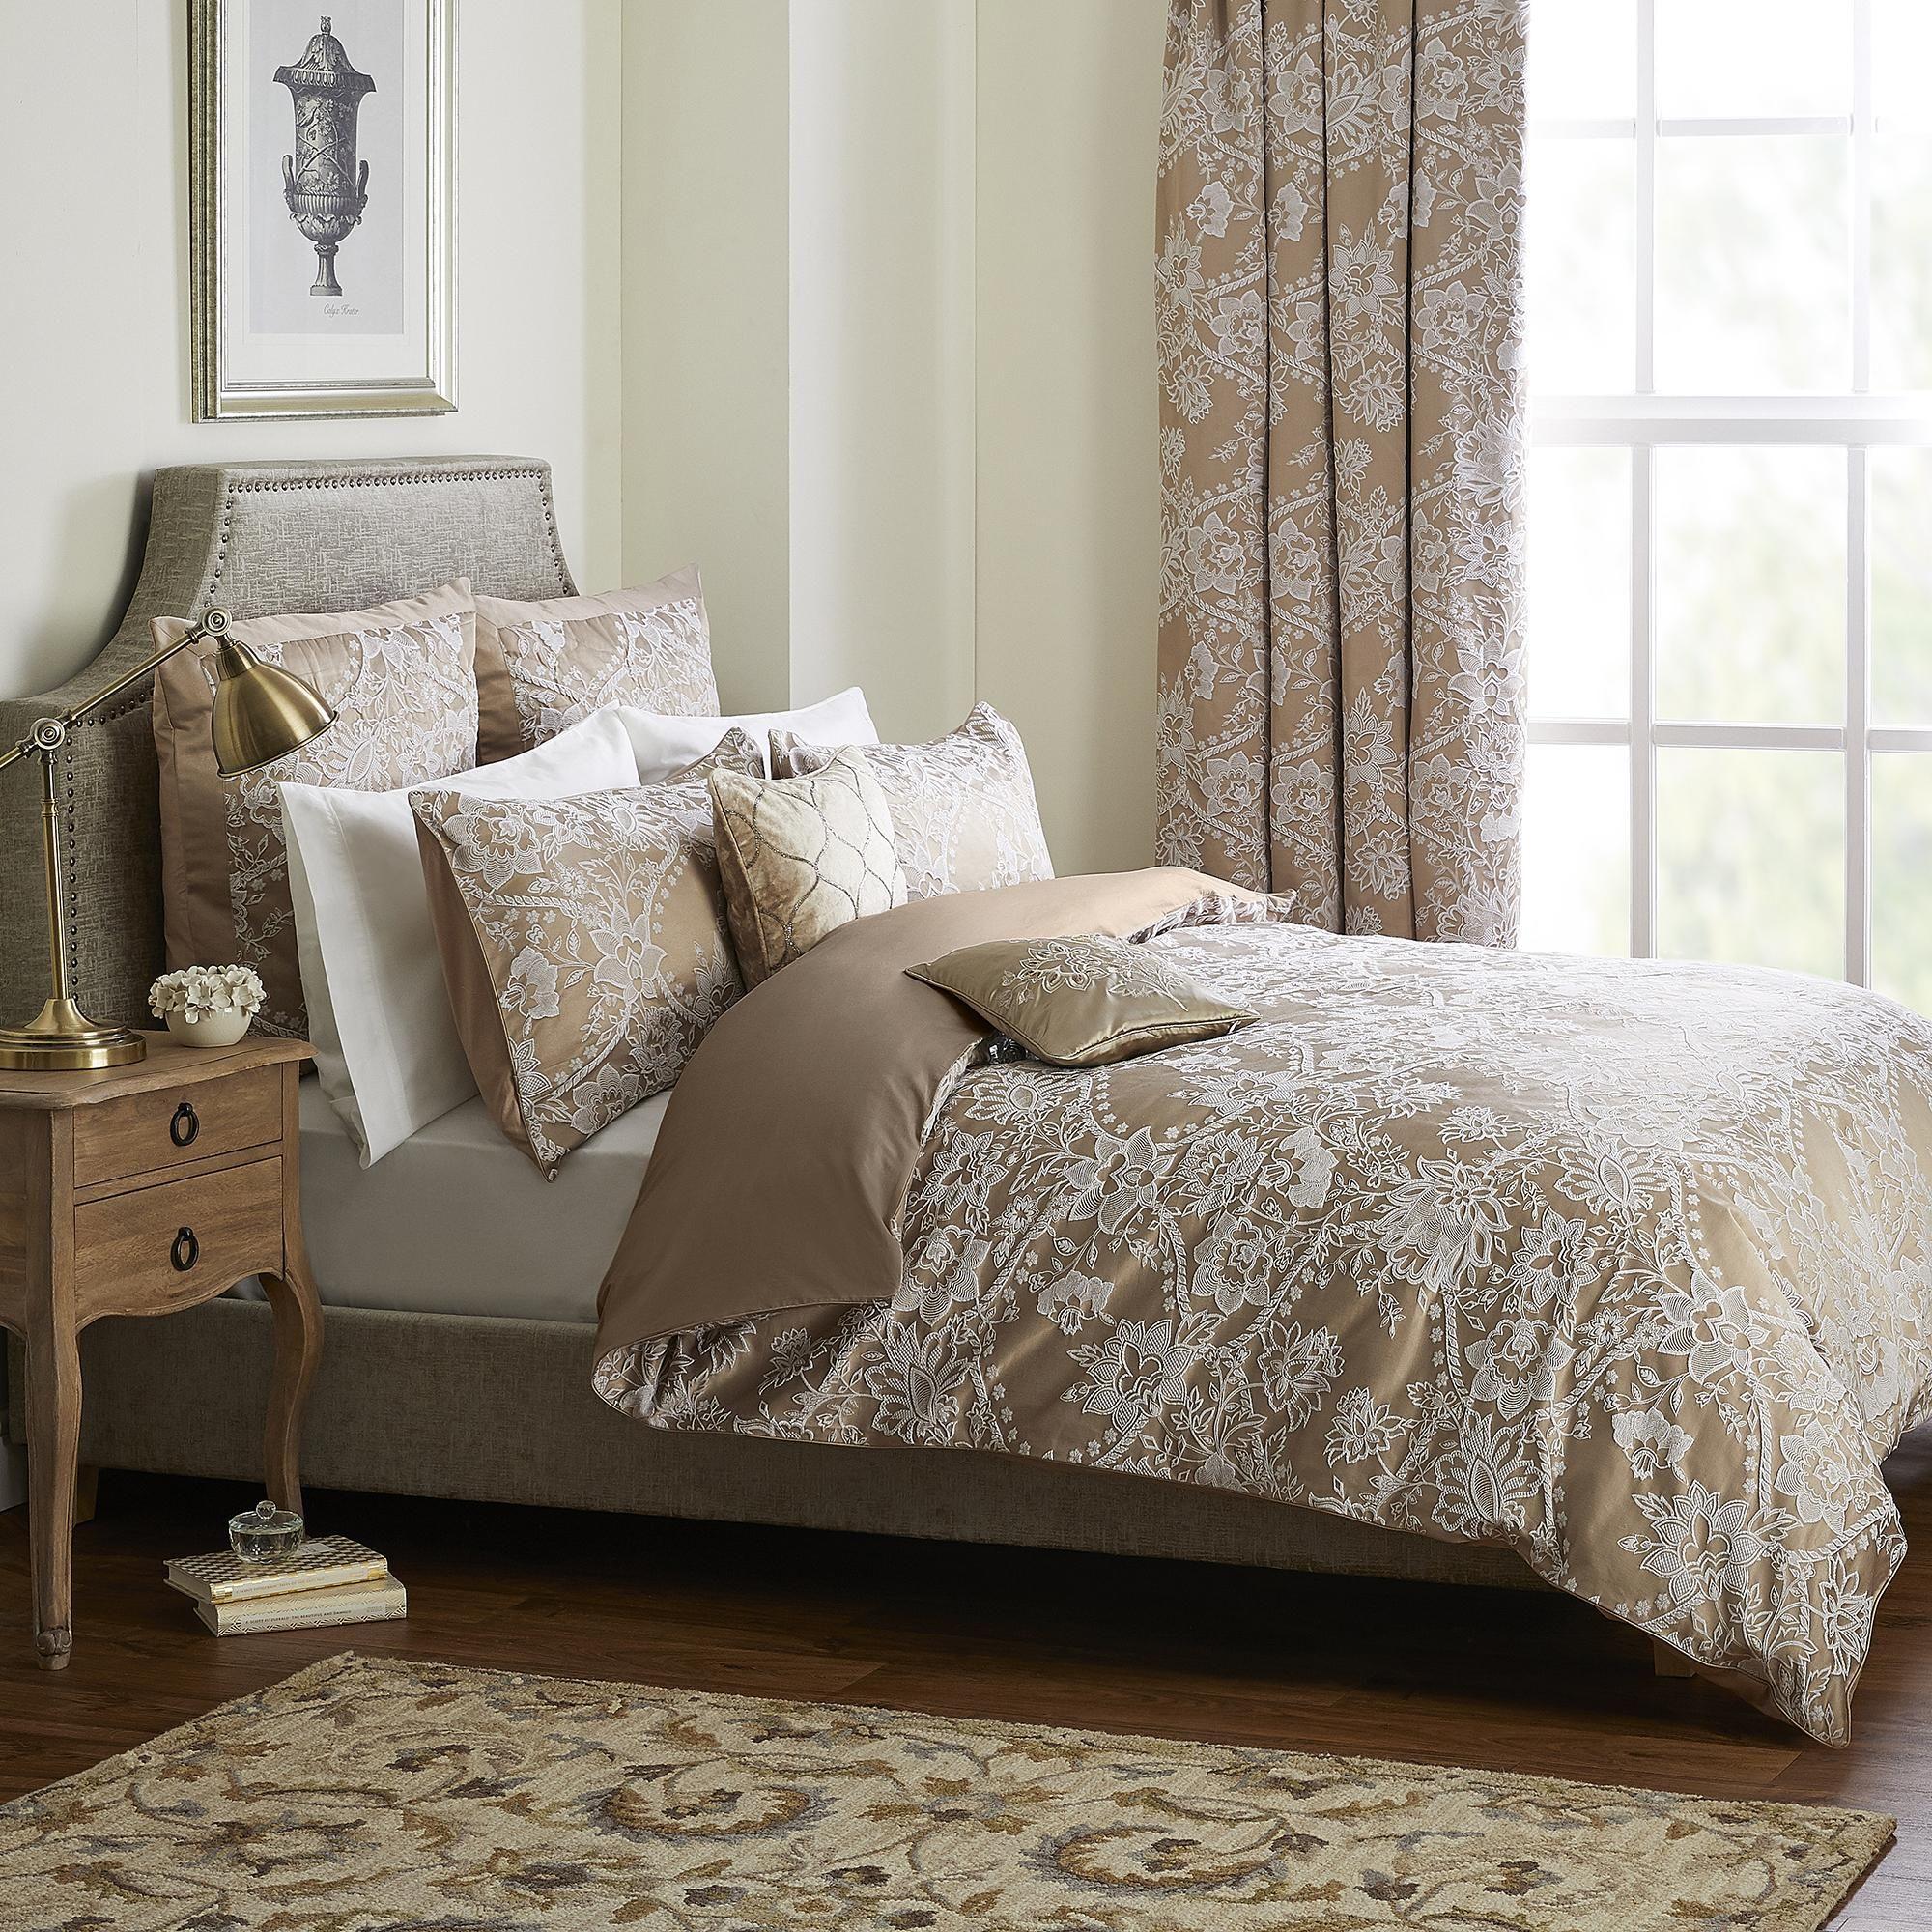 Contemporary Cream Jacquard Brown Duvet Cover Bedding Set Single Double King